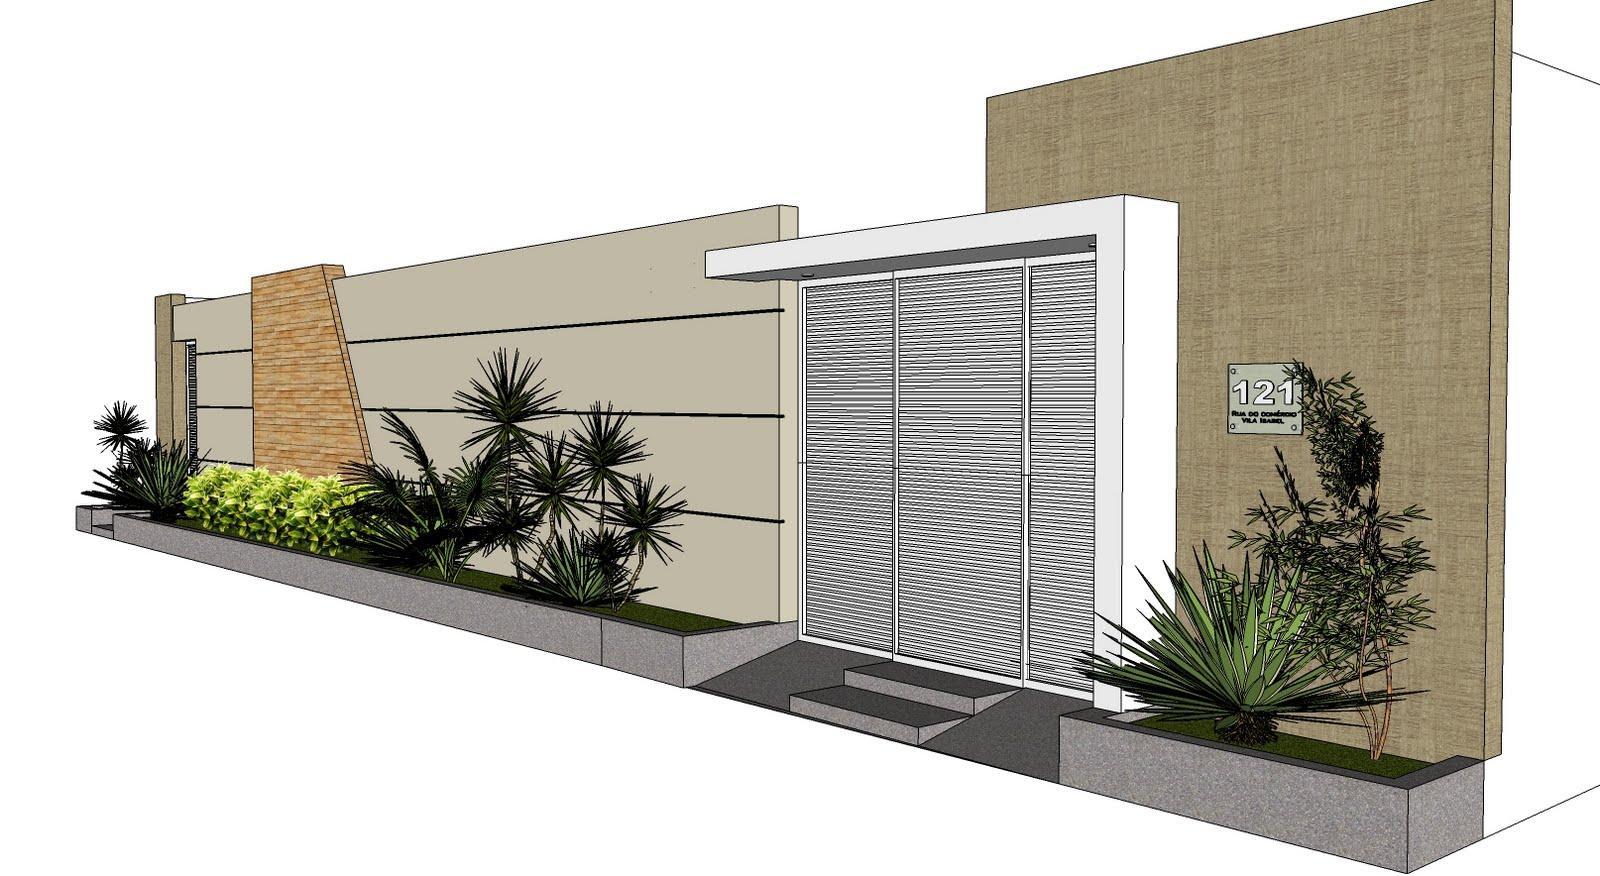 60 modelos de muros residenciais fachadas fotos e dicas for Fotos fachadas